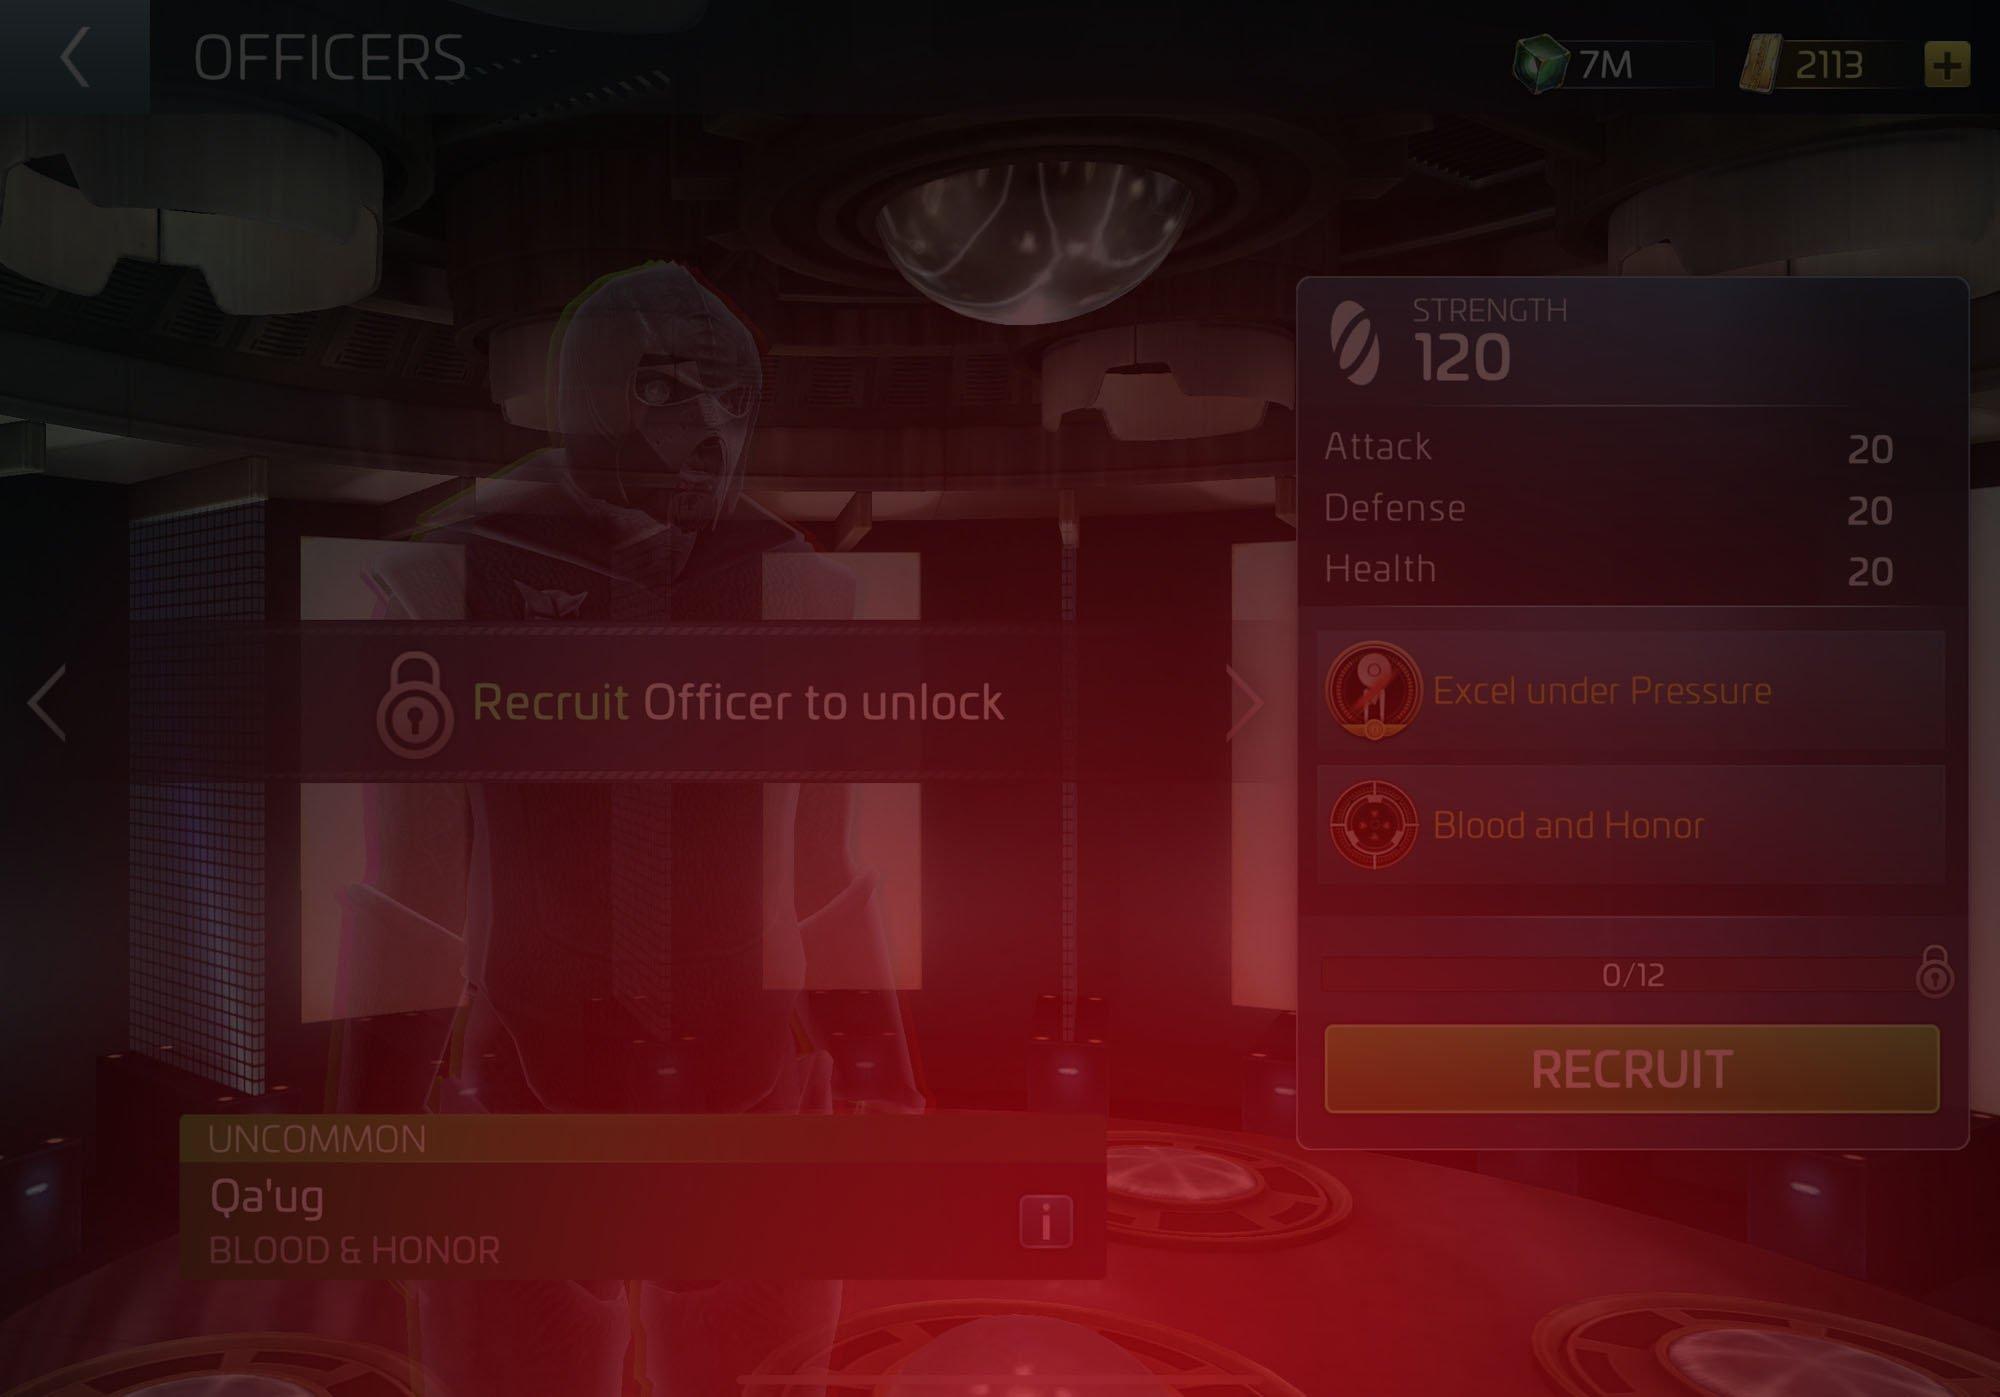 Officer Qa'ug